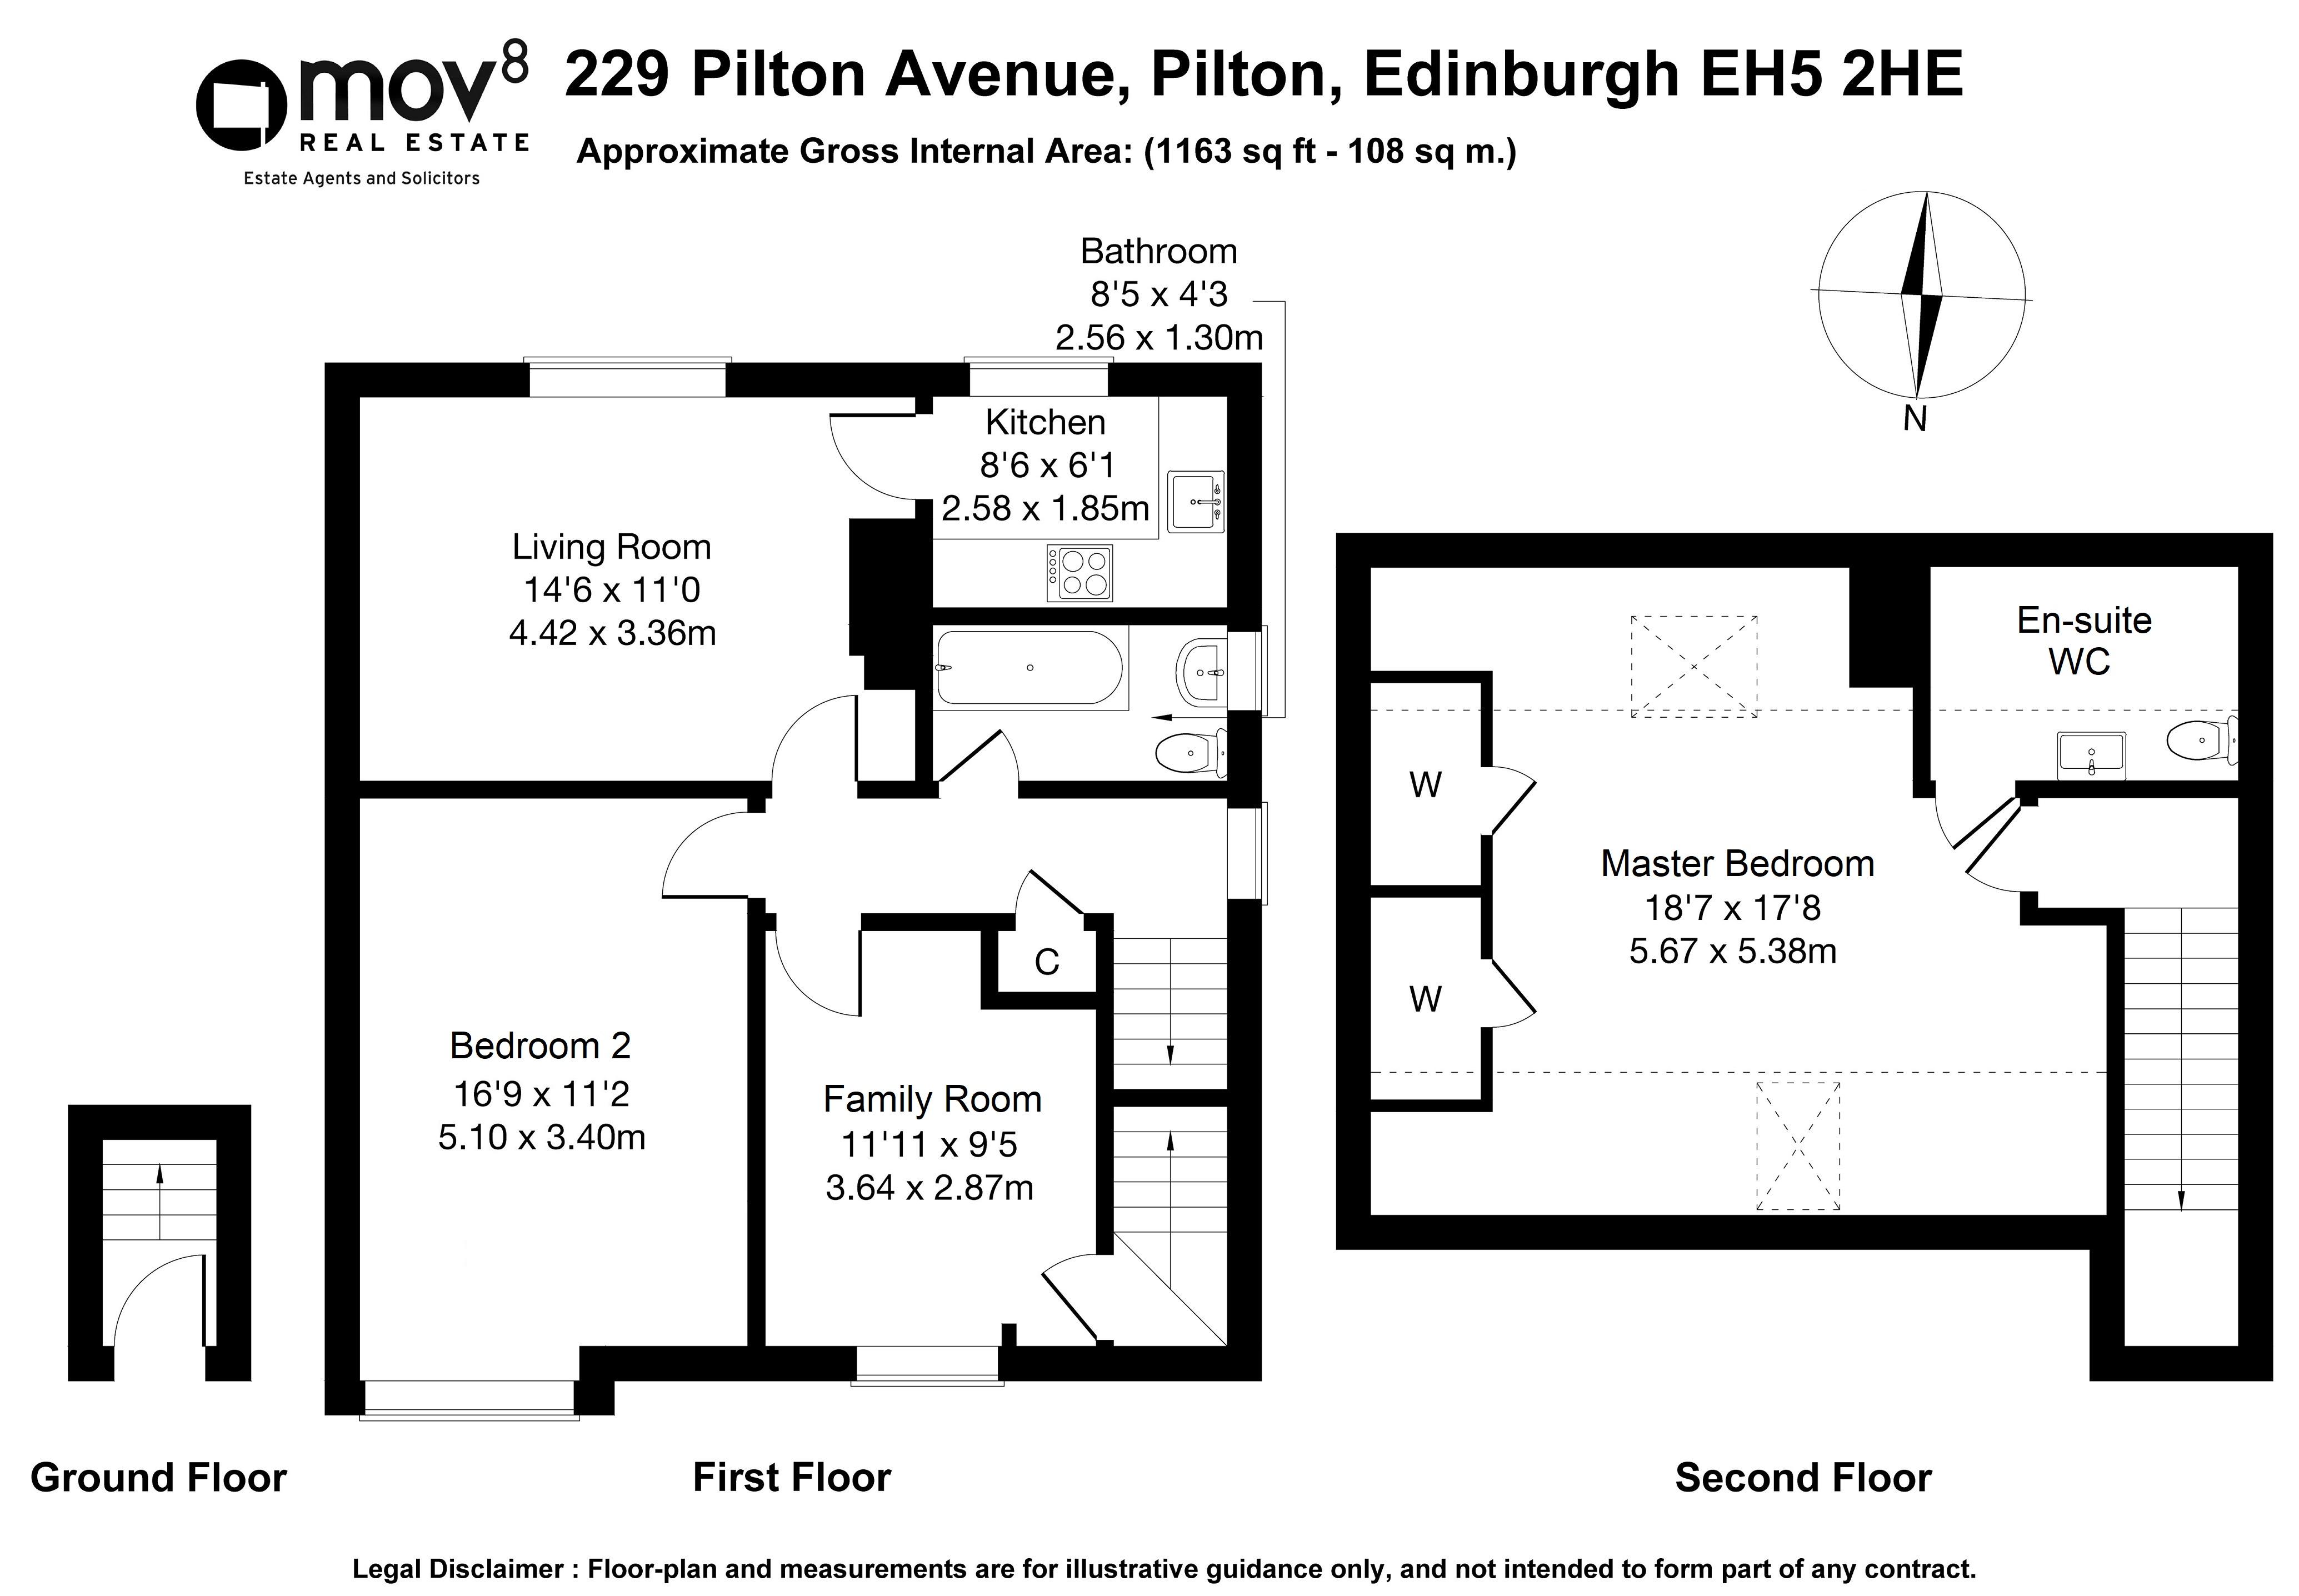 Floorplan 1 of 229 Pilton Avenue, Pilton, Edinburgh, EH5 2HE